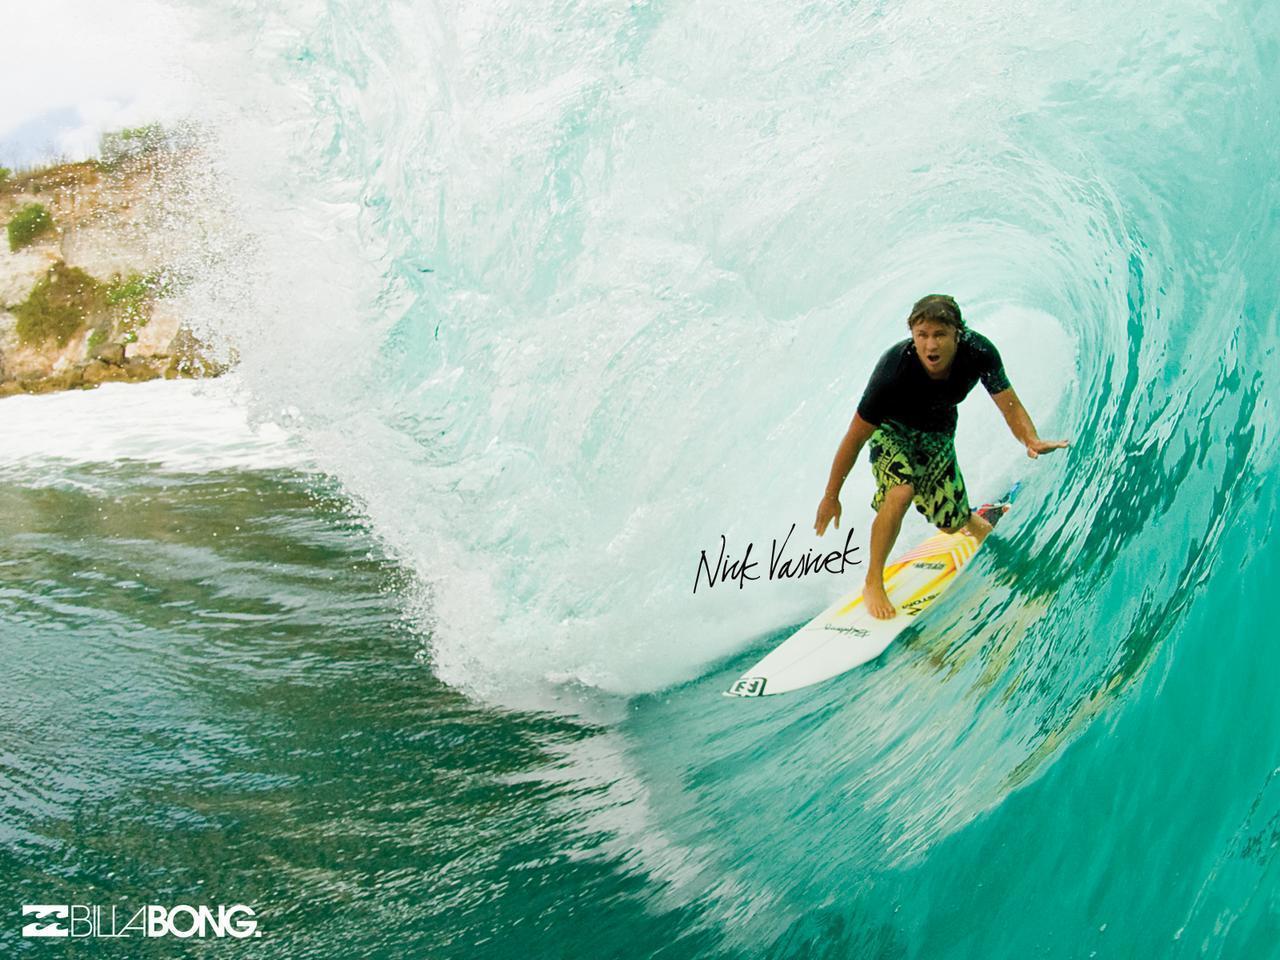 Billabong Surfing Wallpaper - WallpaperSafari